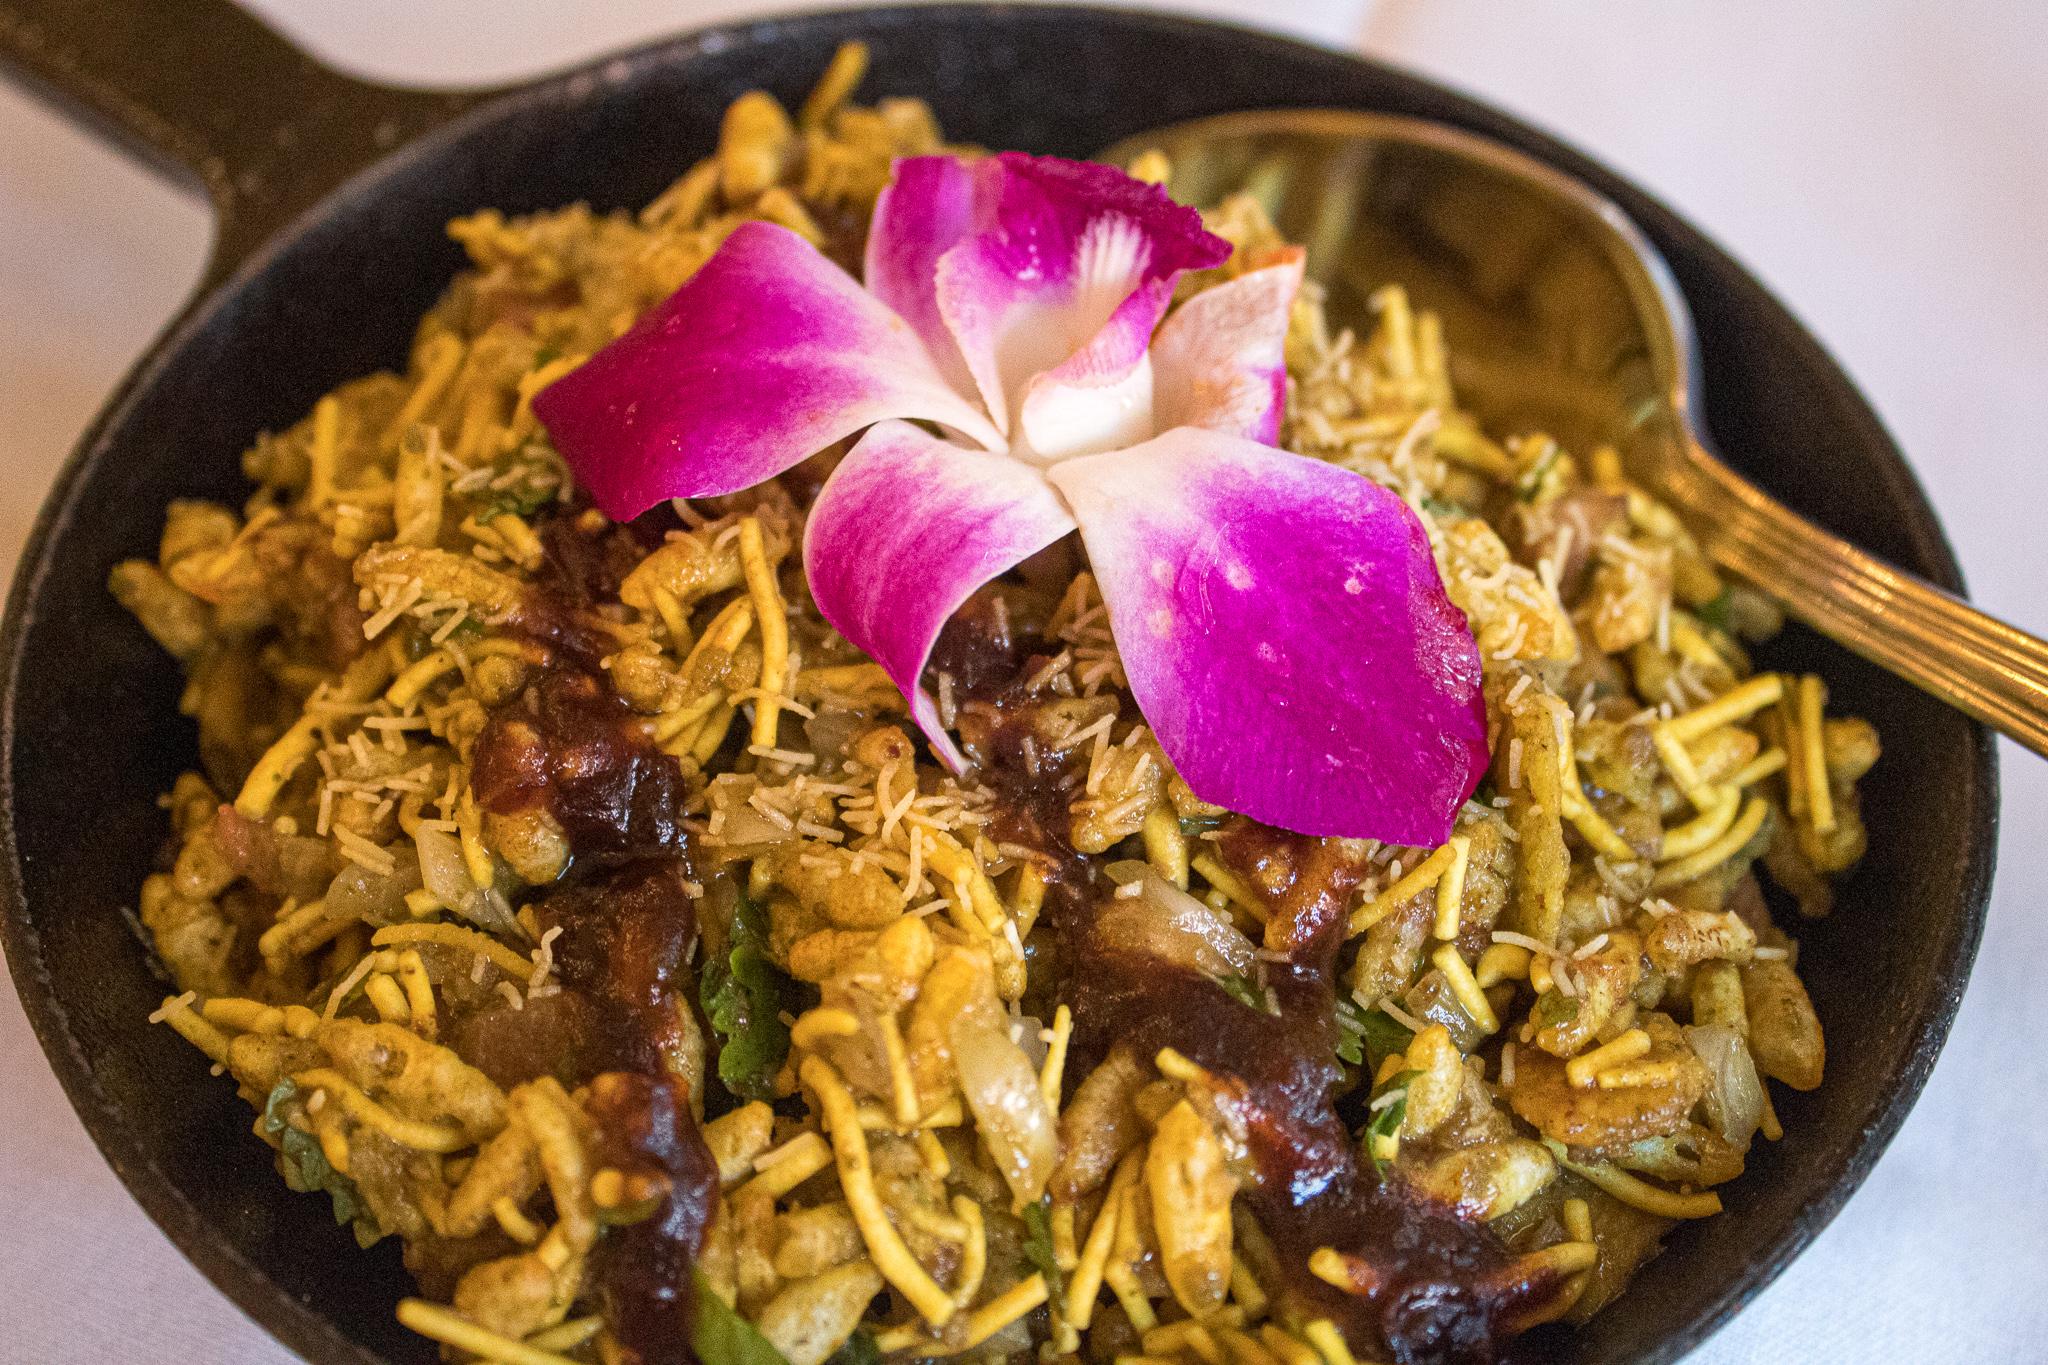 BHEL PURI - mixture of rice puffs, red onions, tomatoes & chutneys